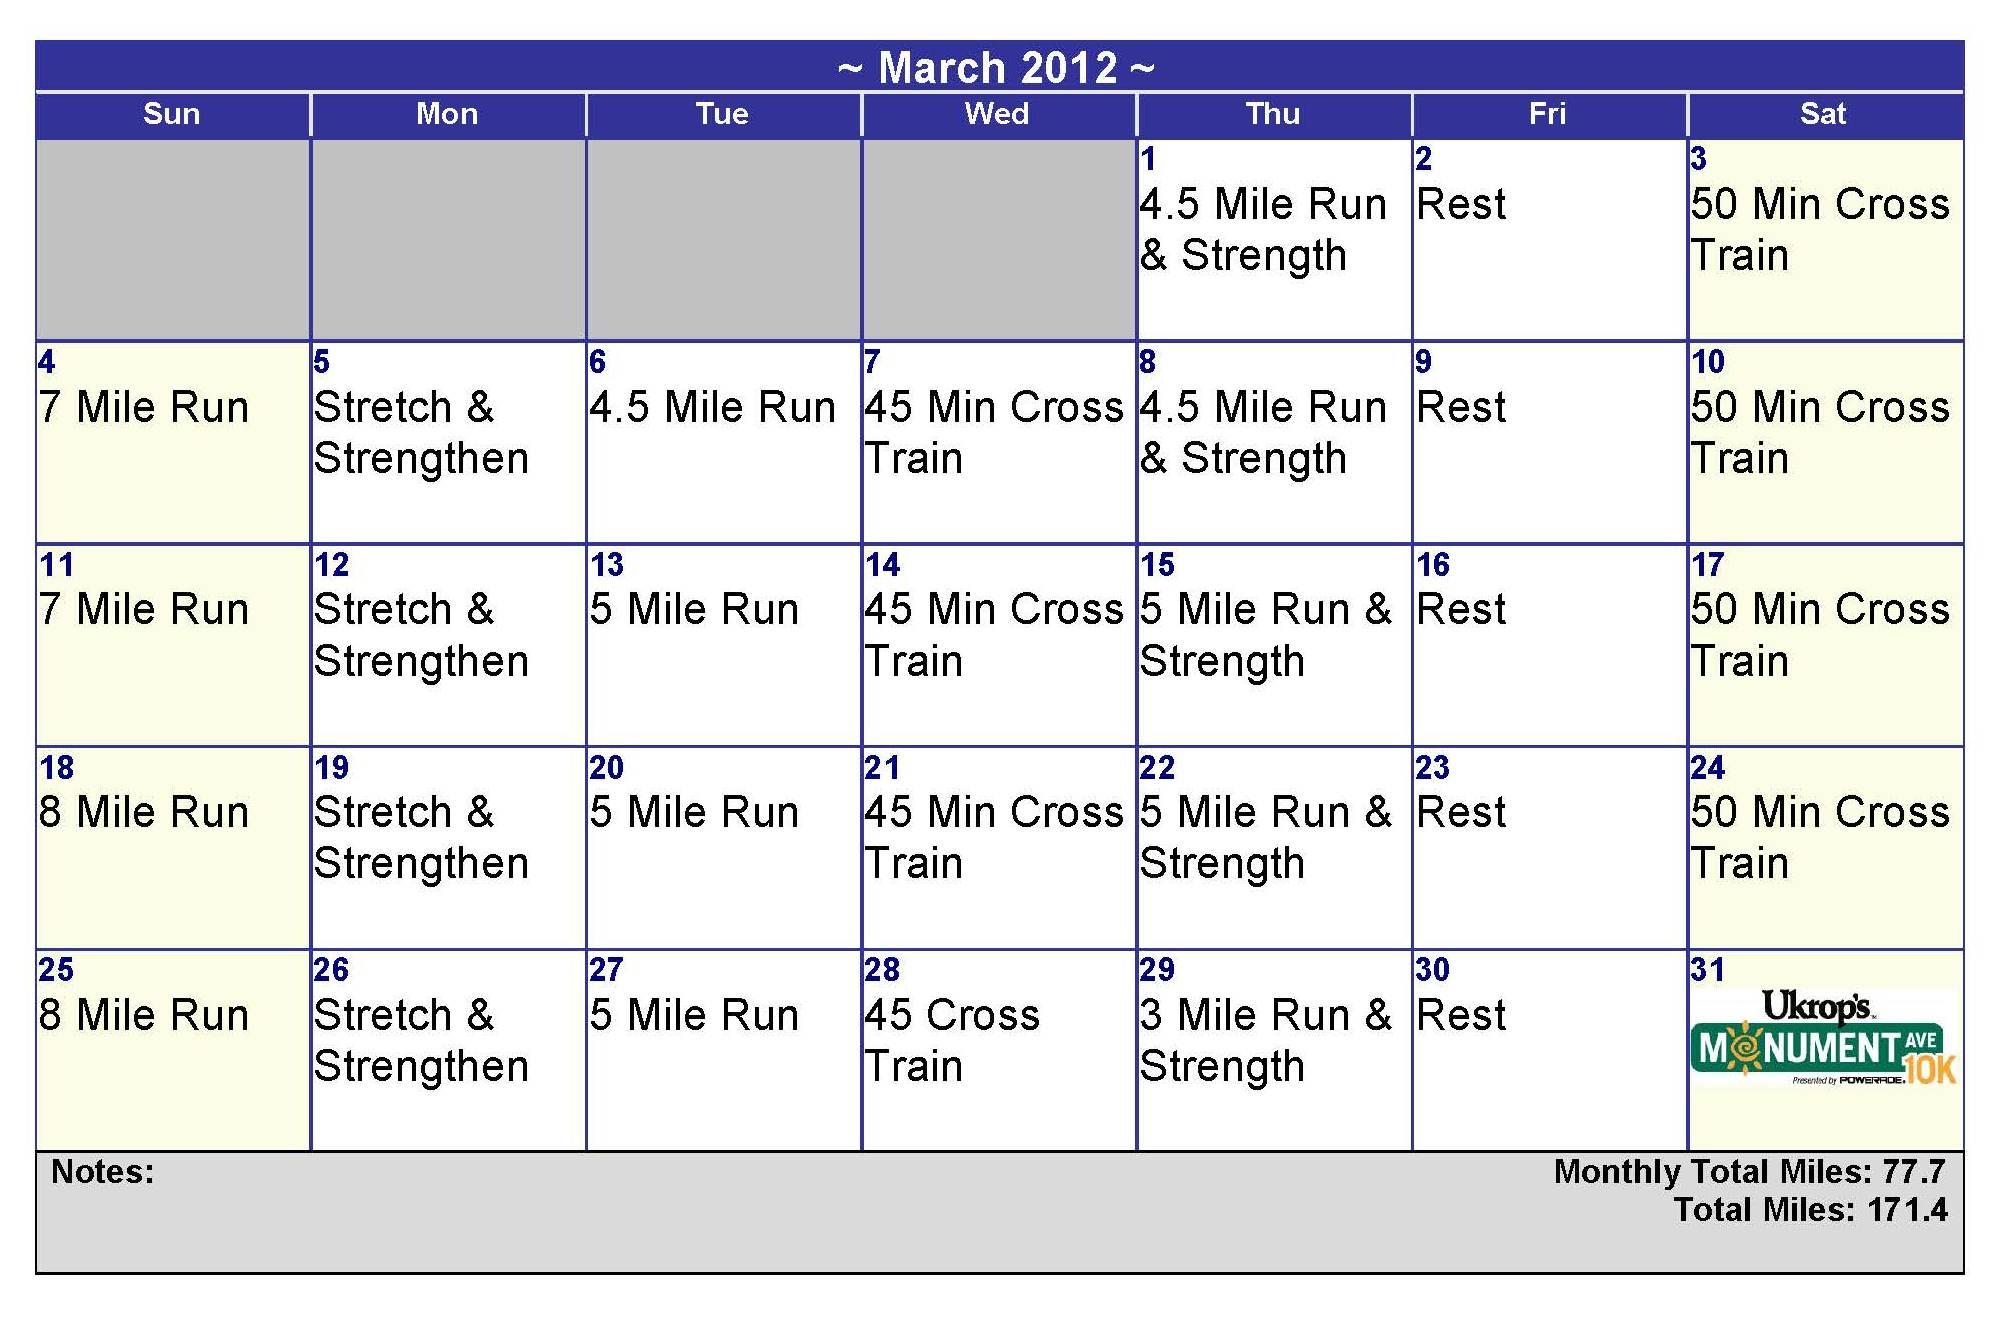 Half Marathon Calendar.Half Marathon Training Calendar The Sassy Swan